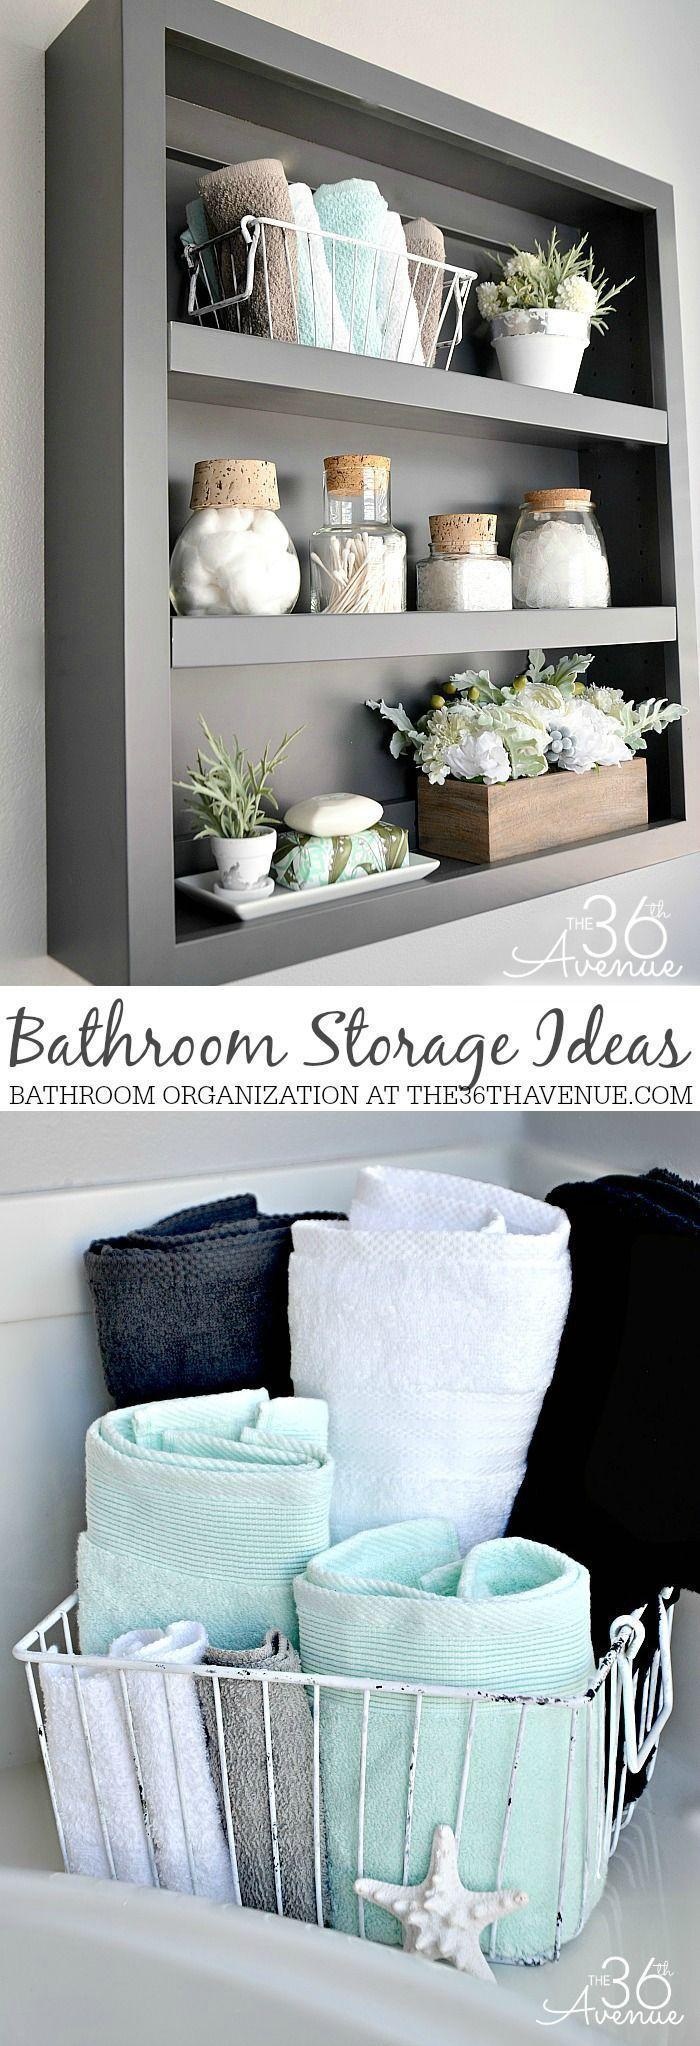 Bathroom Storage and Organization Ideas at the36thavenue.com #cleaning #bathroom #bathroomcleaning